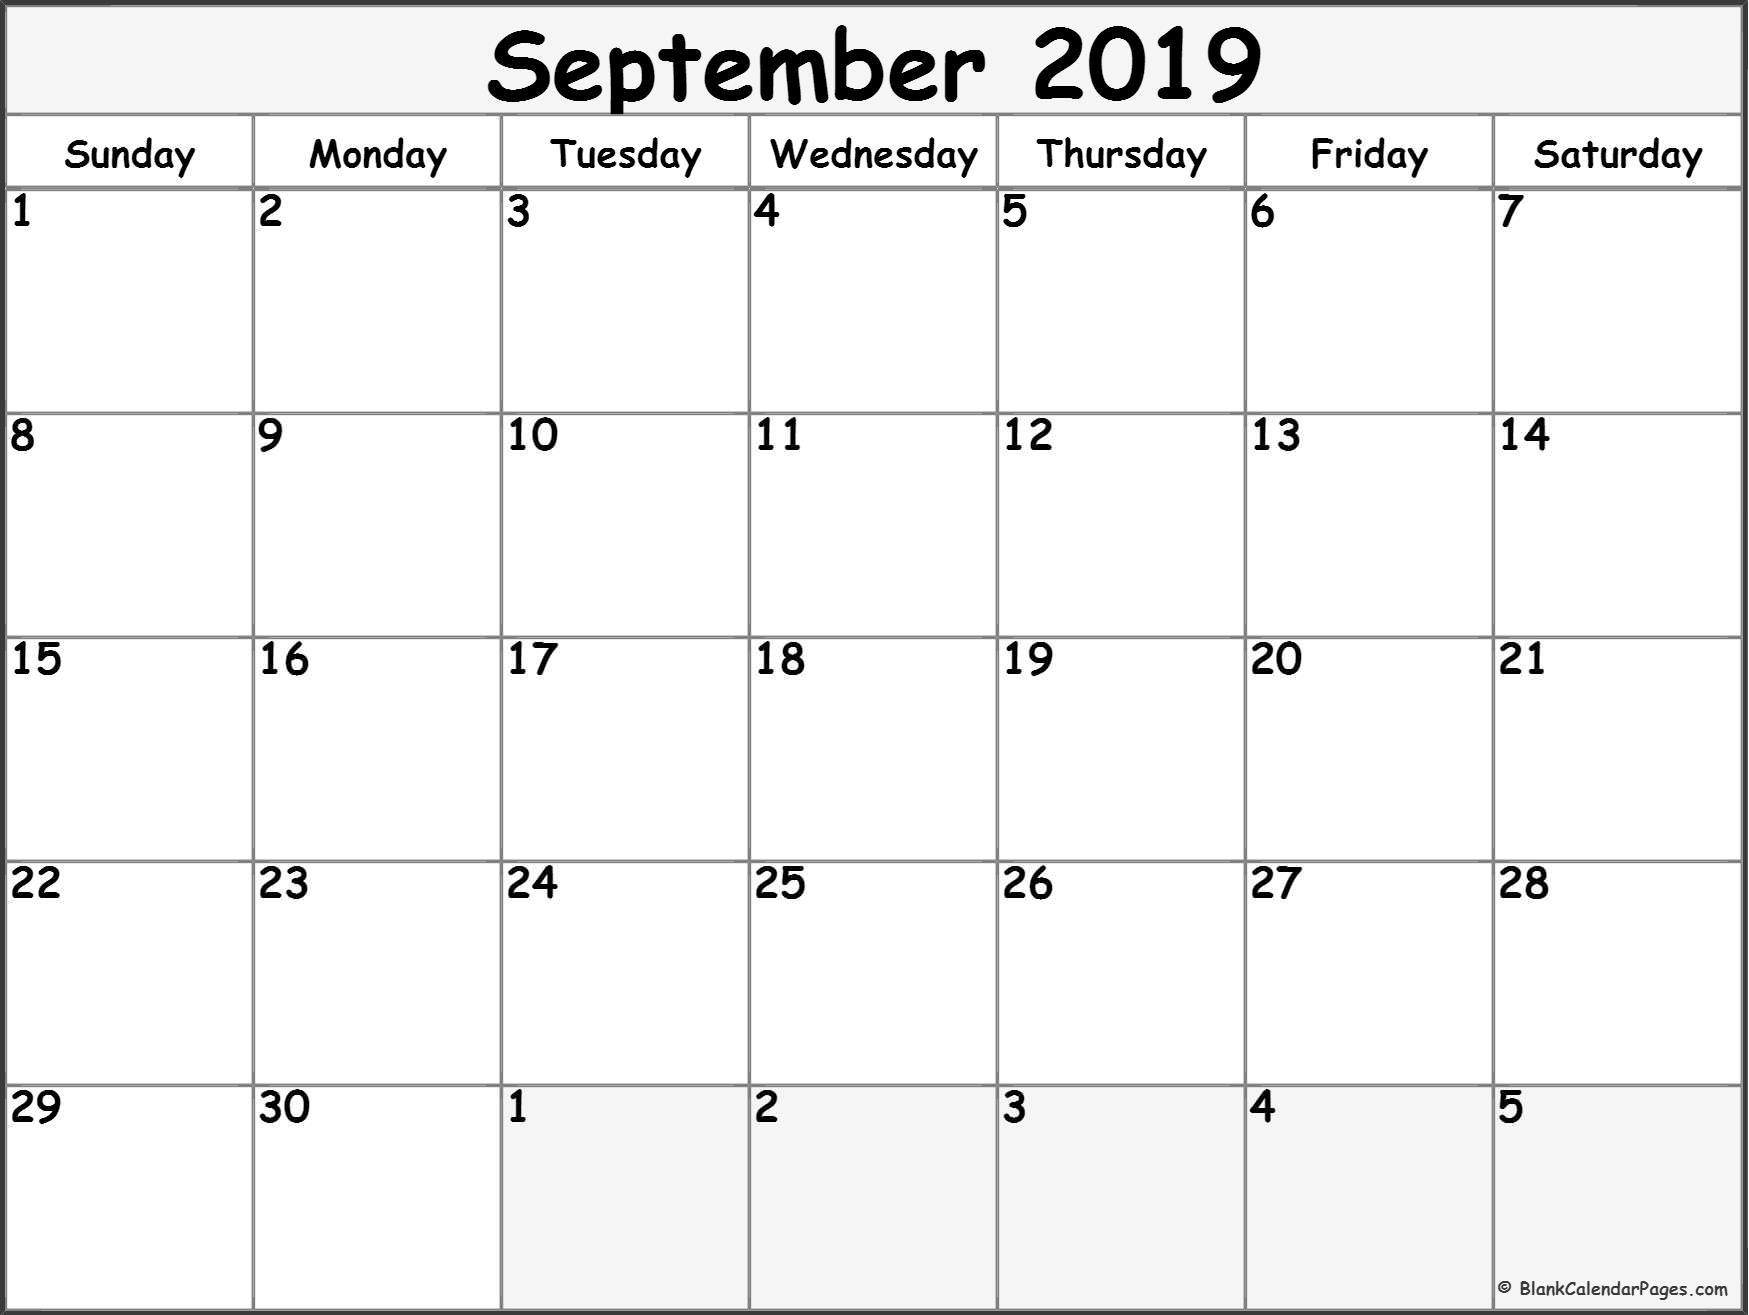 September 2019 Calendar | Free Printable Monthly Calendars for Blank Monthly Calendar September